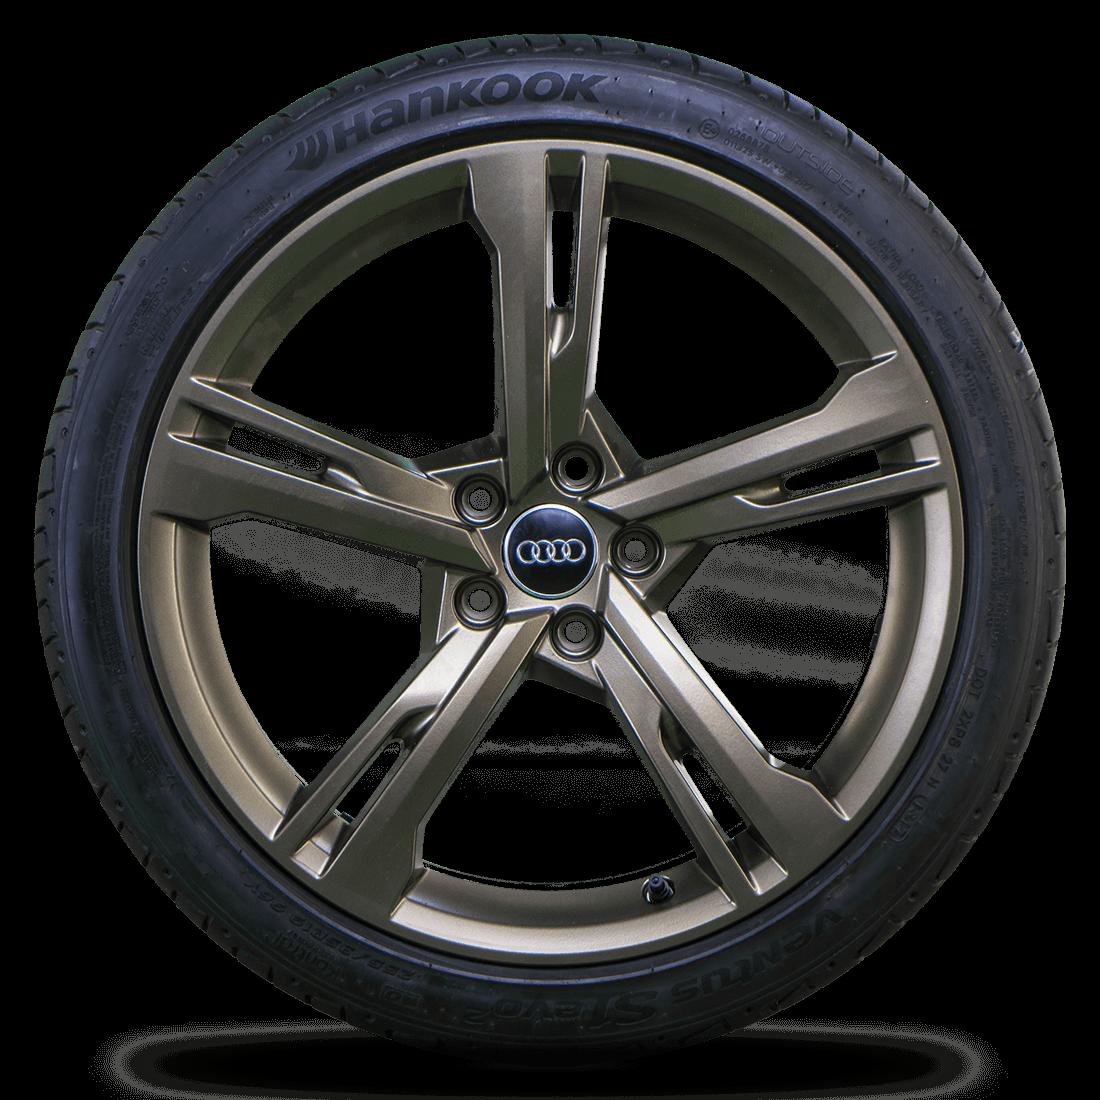 Audi 19 Inch Summer Wheels A5 S5 8W Cabrio Coupe Rat Theus Rim